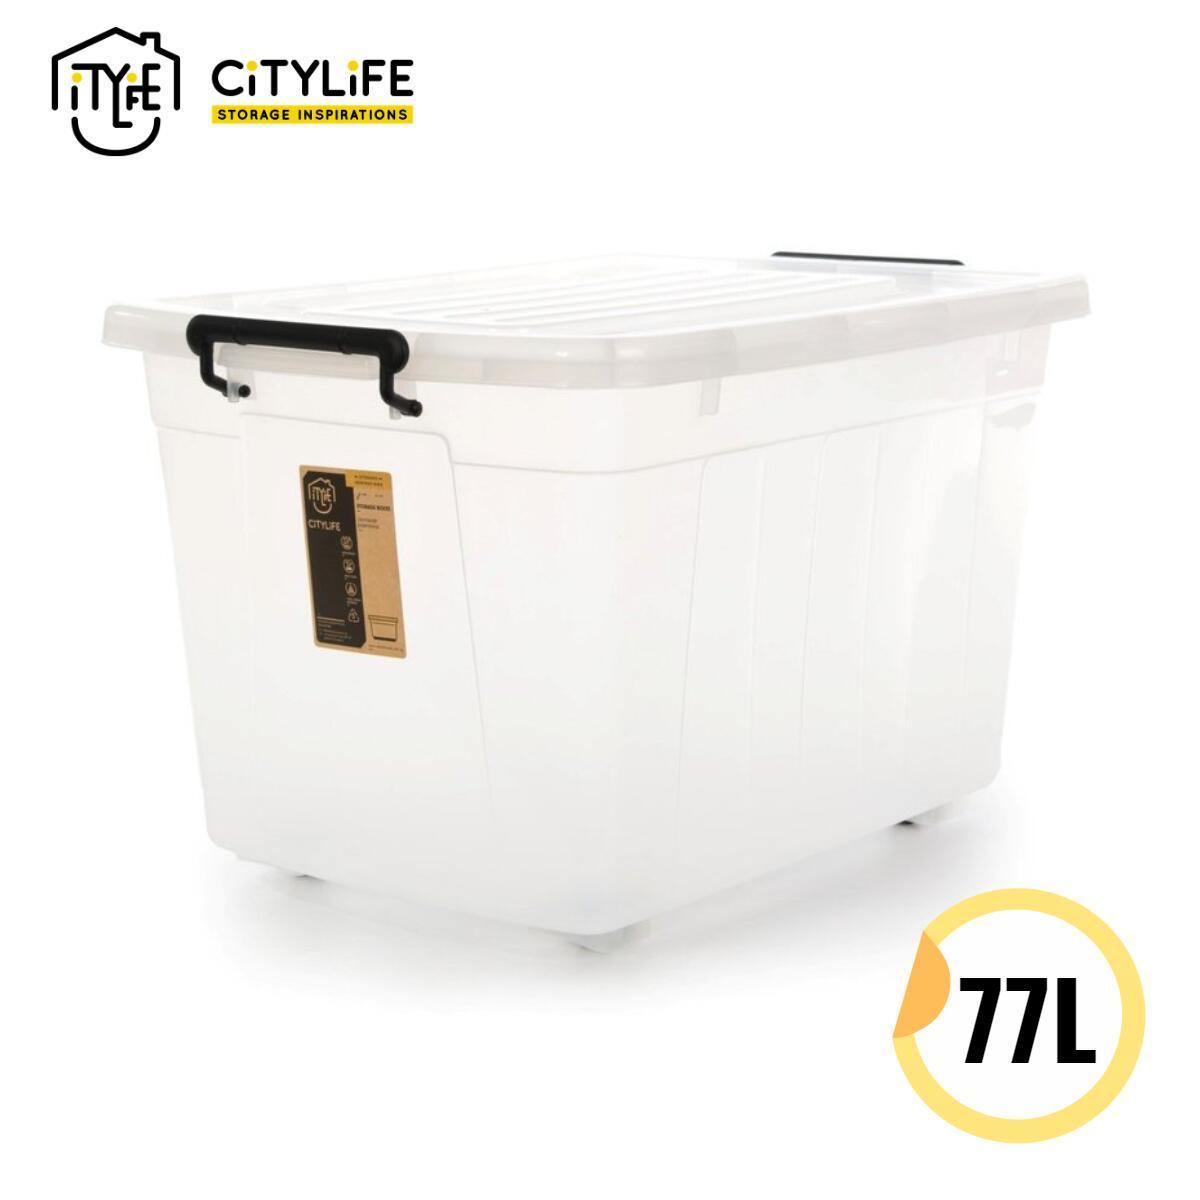 [BUNDLE OF 2] -  Citylife Large Capacity Storage Box with Wheels - 77L